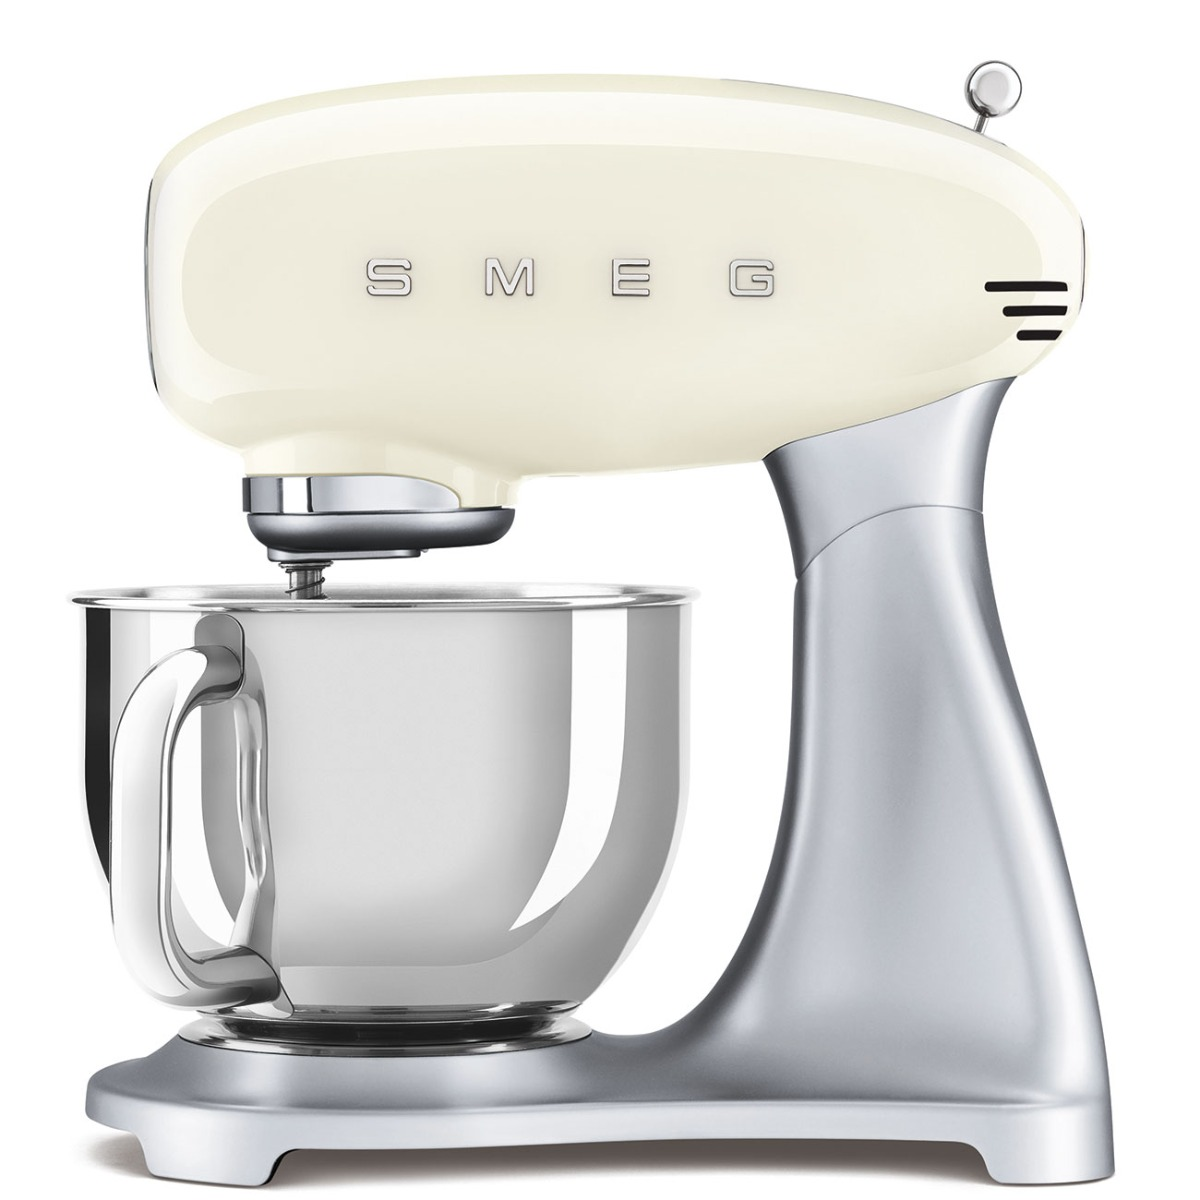 50's Retro Style Stand Mixer Cream